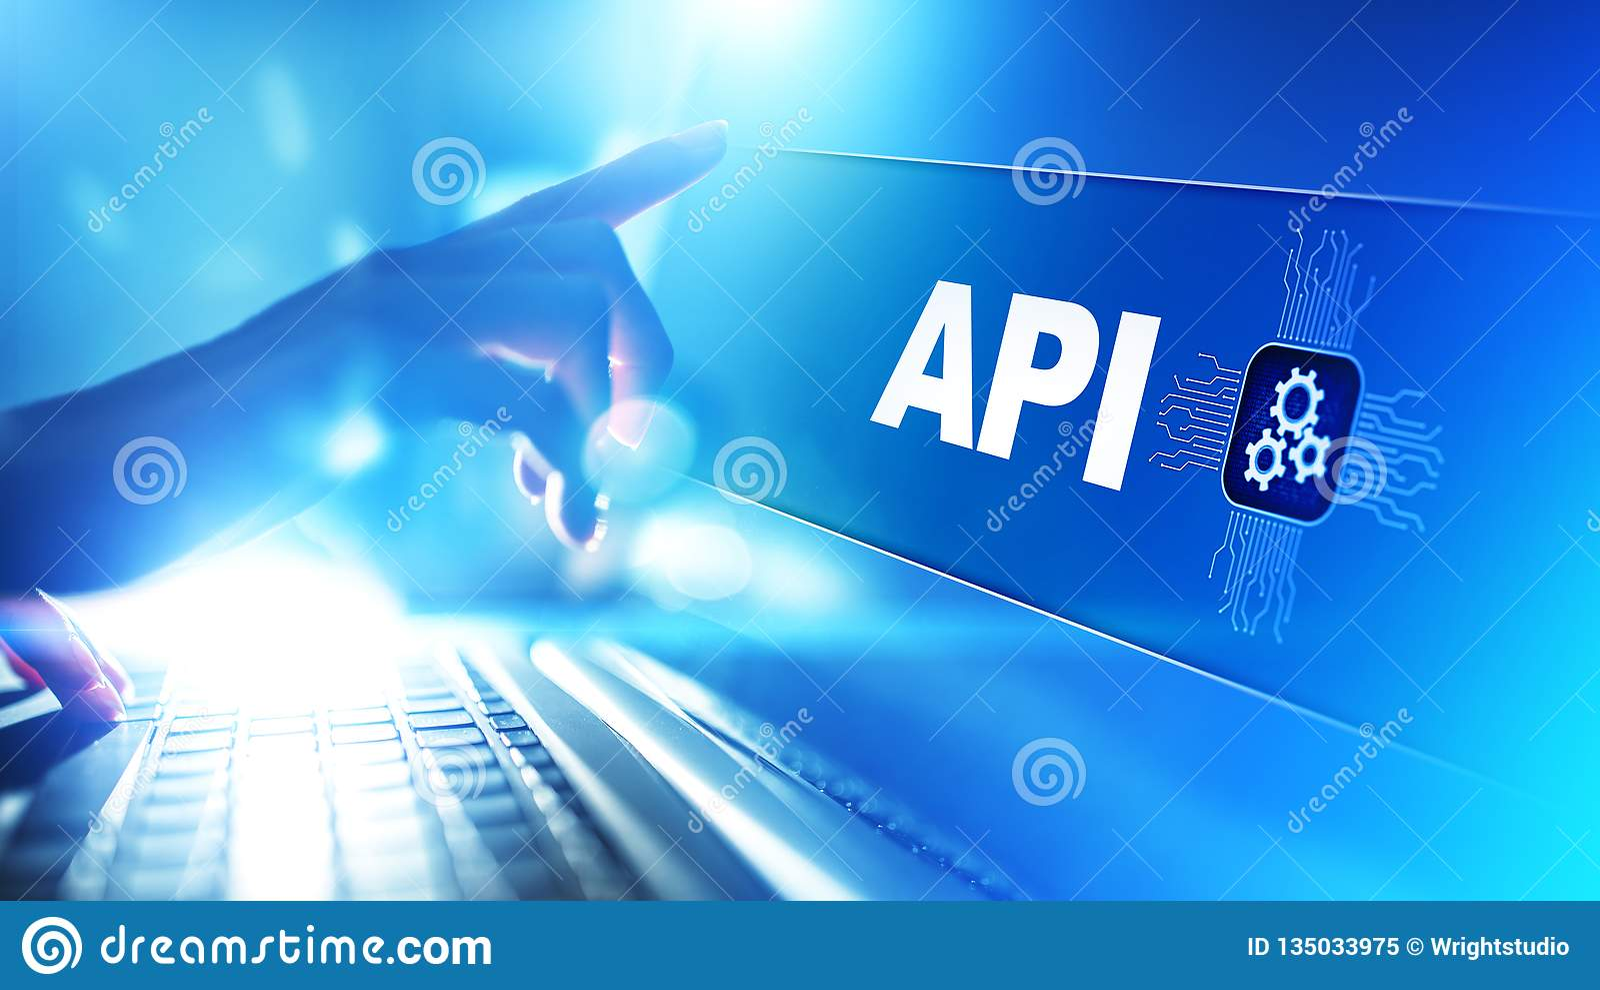 API - Διεπαφή προγραμματισμού εφαρμογής, εργαλείο ανάπτυξης λογισμικού, τεχνολογία πληροφοριών και επιχειρησιακή έννοια